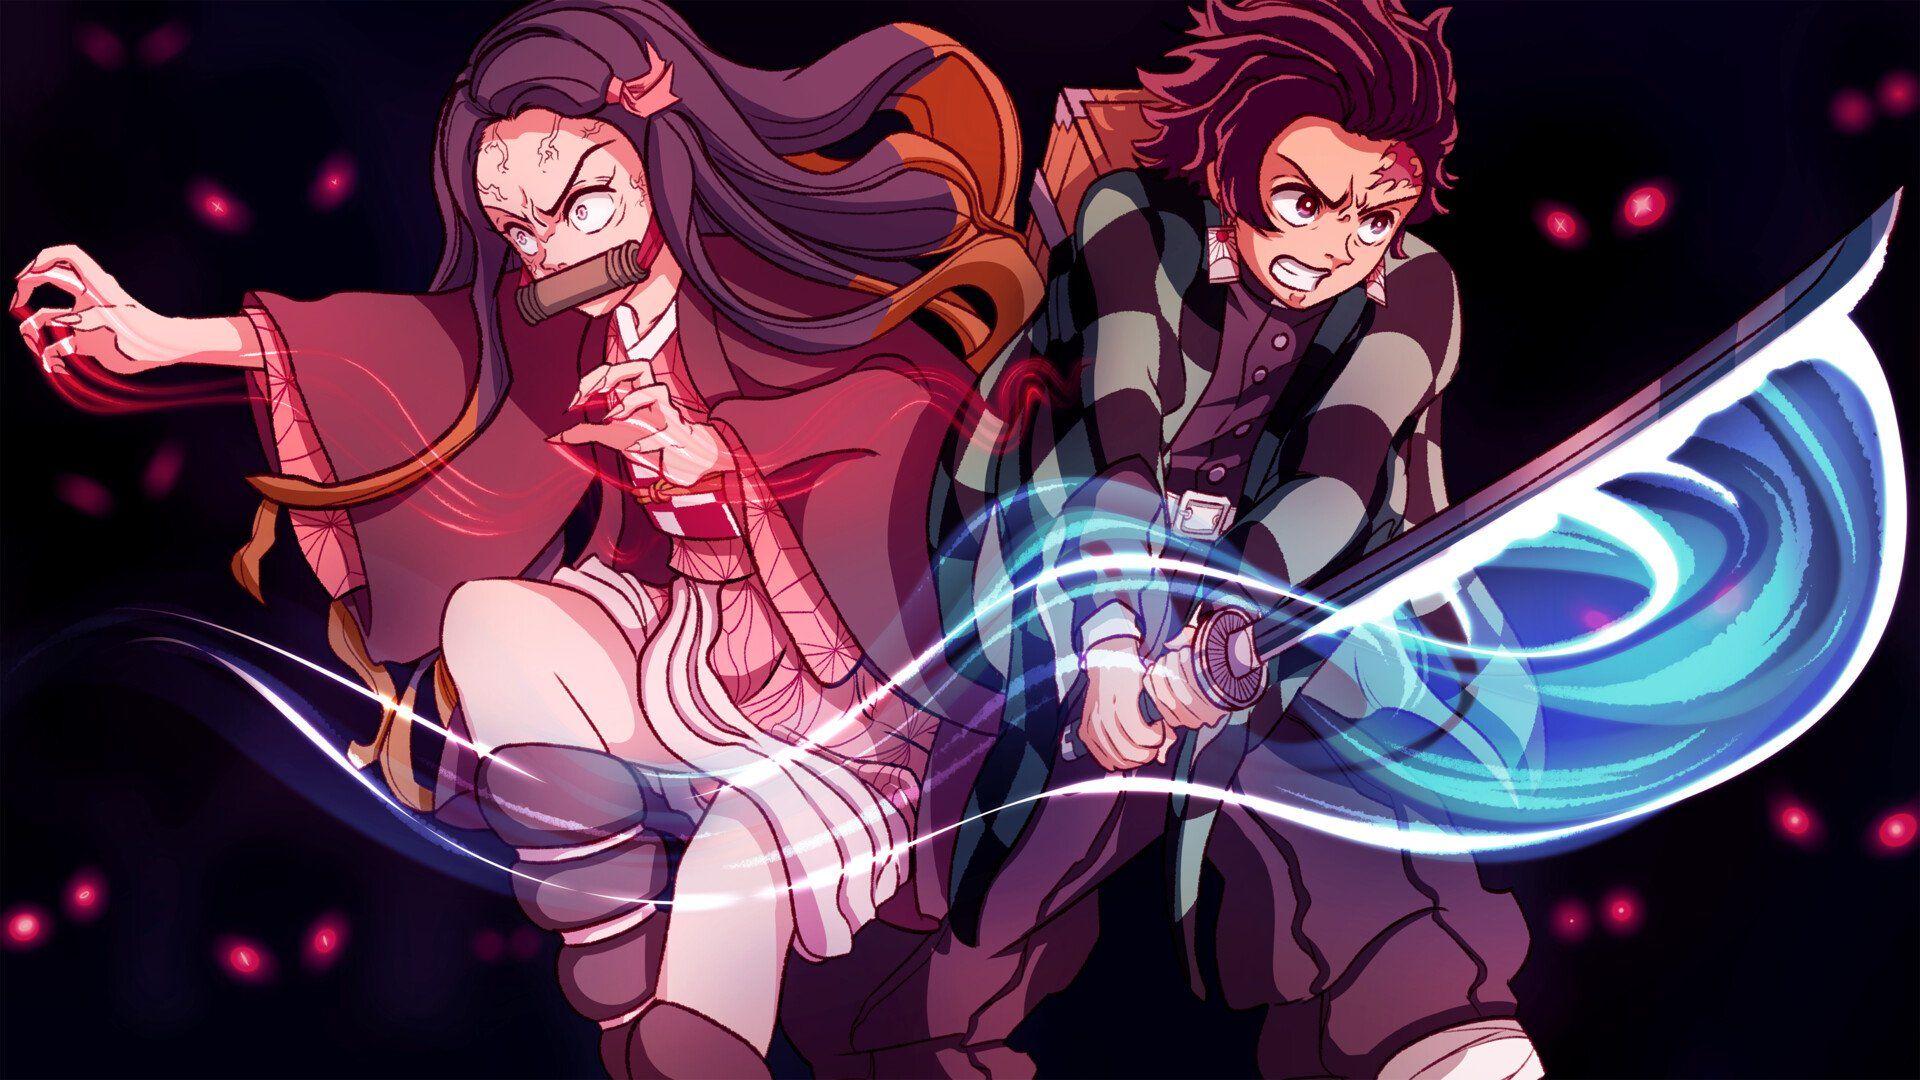 Demon Slayer Kimetsu No Yaiba Chapter 193 Release Date Spoilers Tanjiro And Nezuko Together Will Defeat Muzan In 2020 Anime Demon Slayer